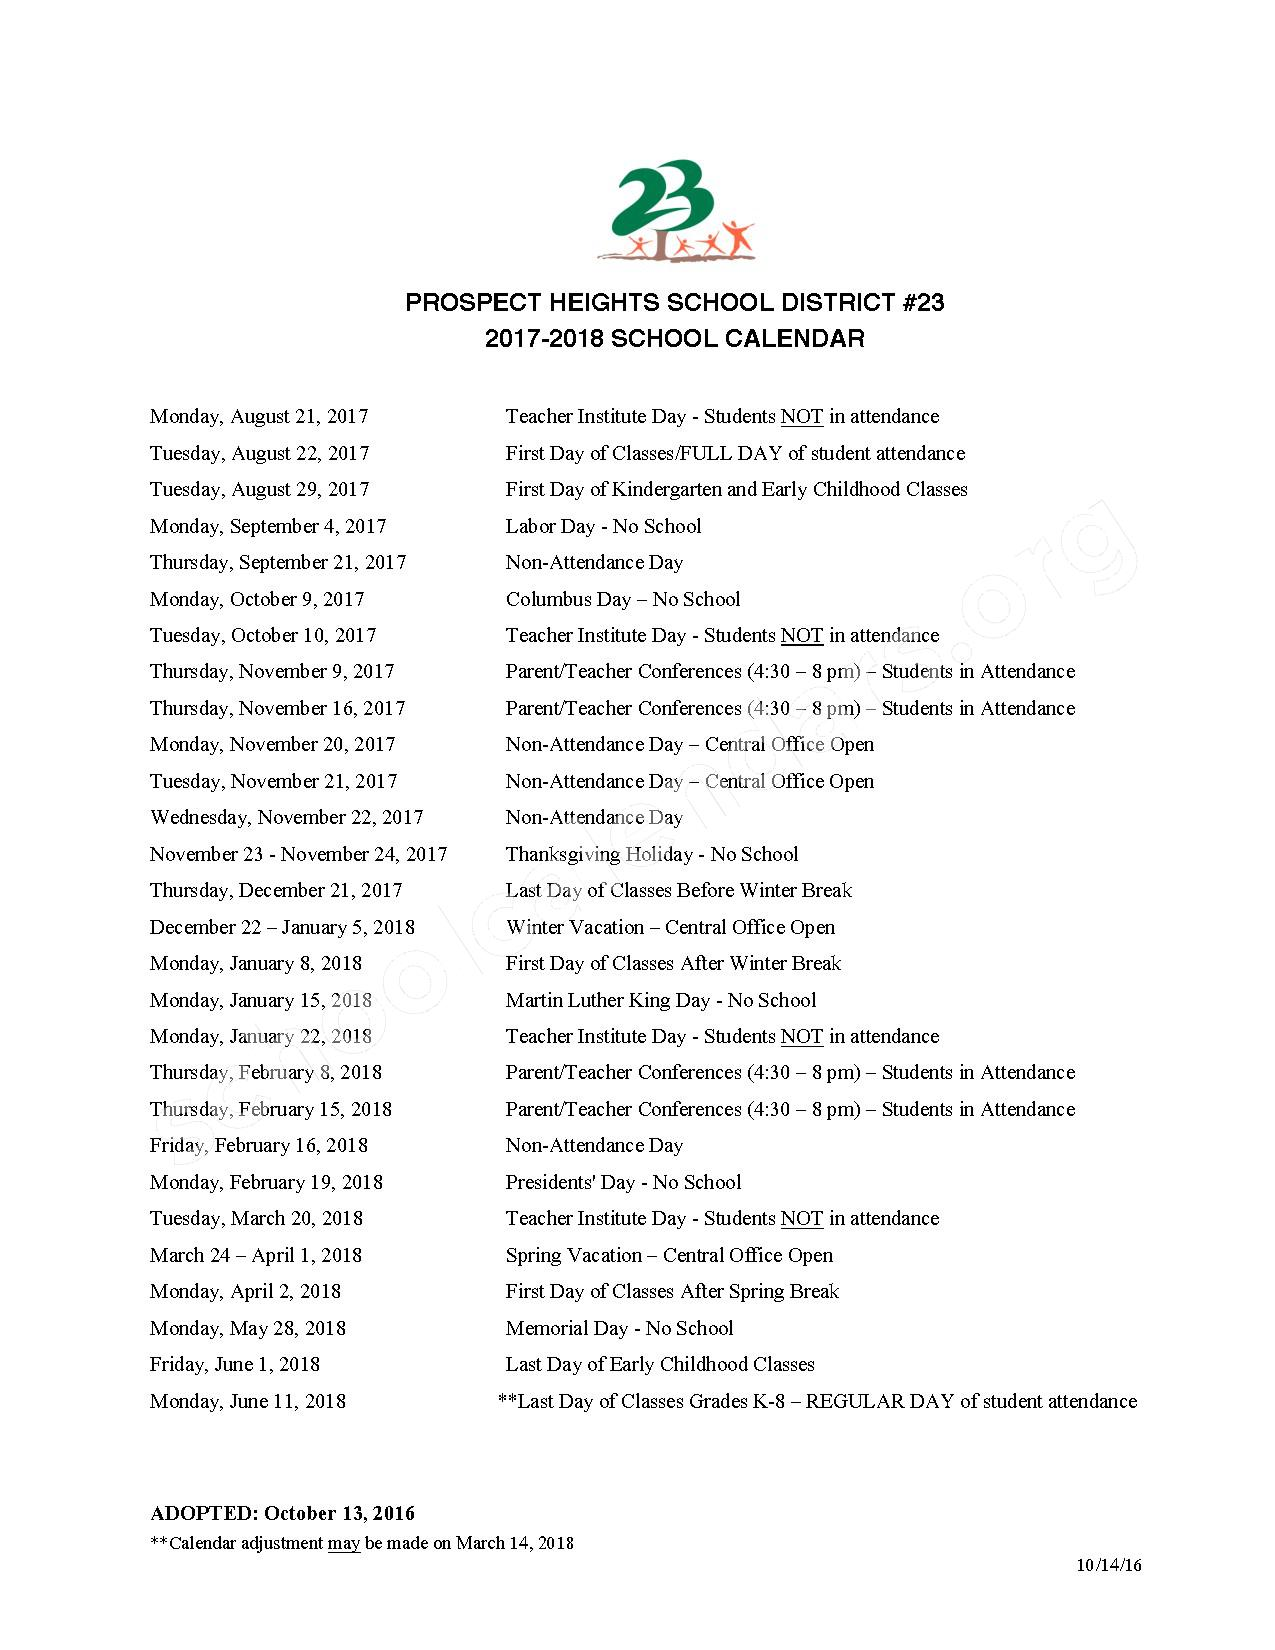 2017 - 2018 School Calendar – Prospect Heights School District 23 – page 1